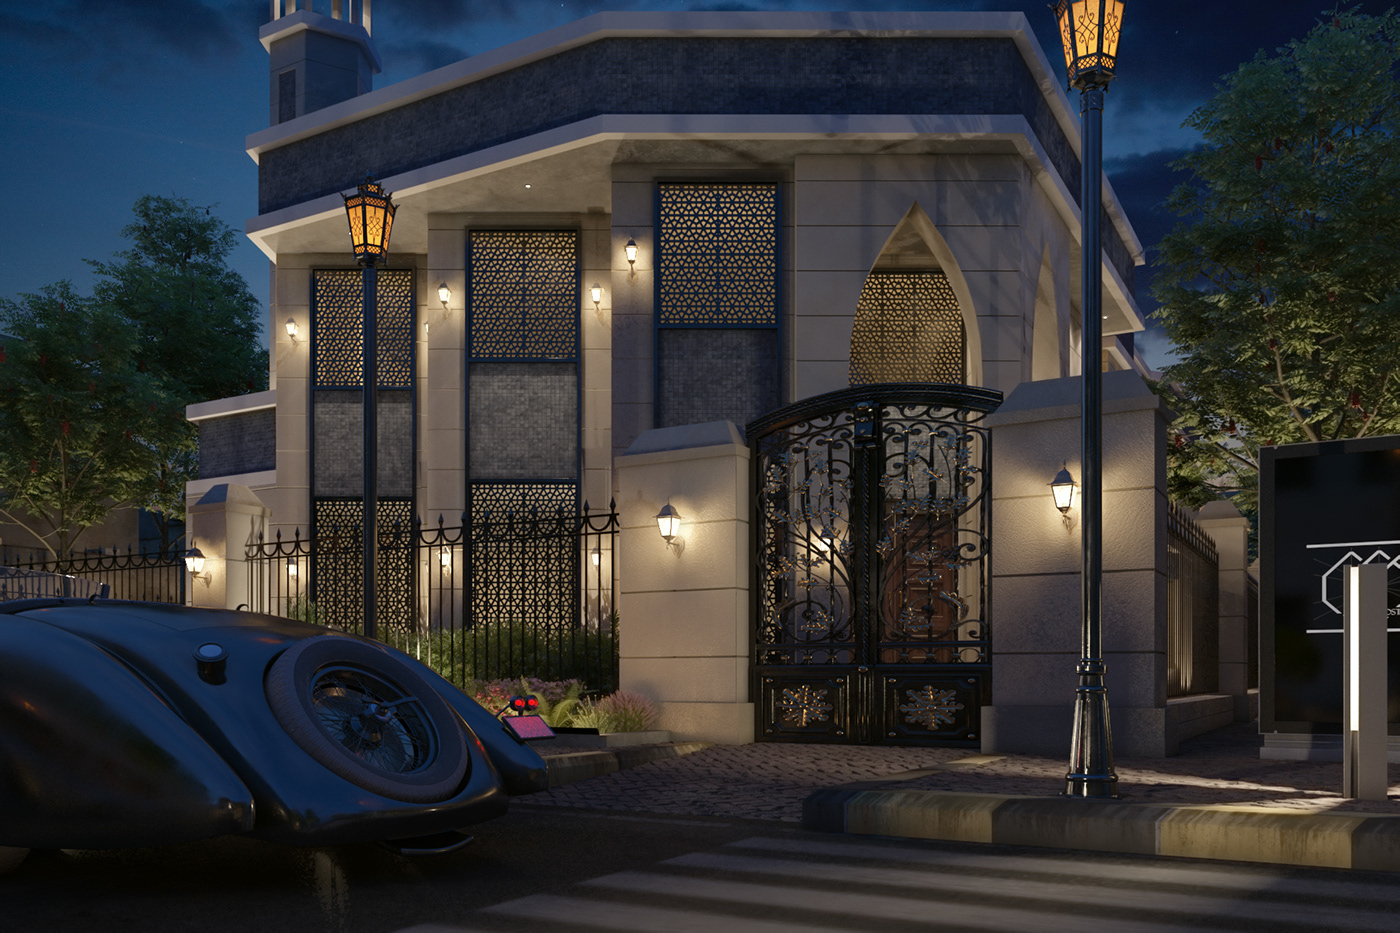 architecture design modern exterior visualization graphics 3dsmax vray Motaz mostafa